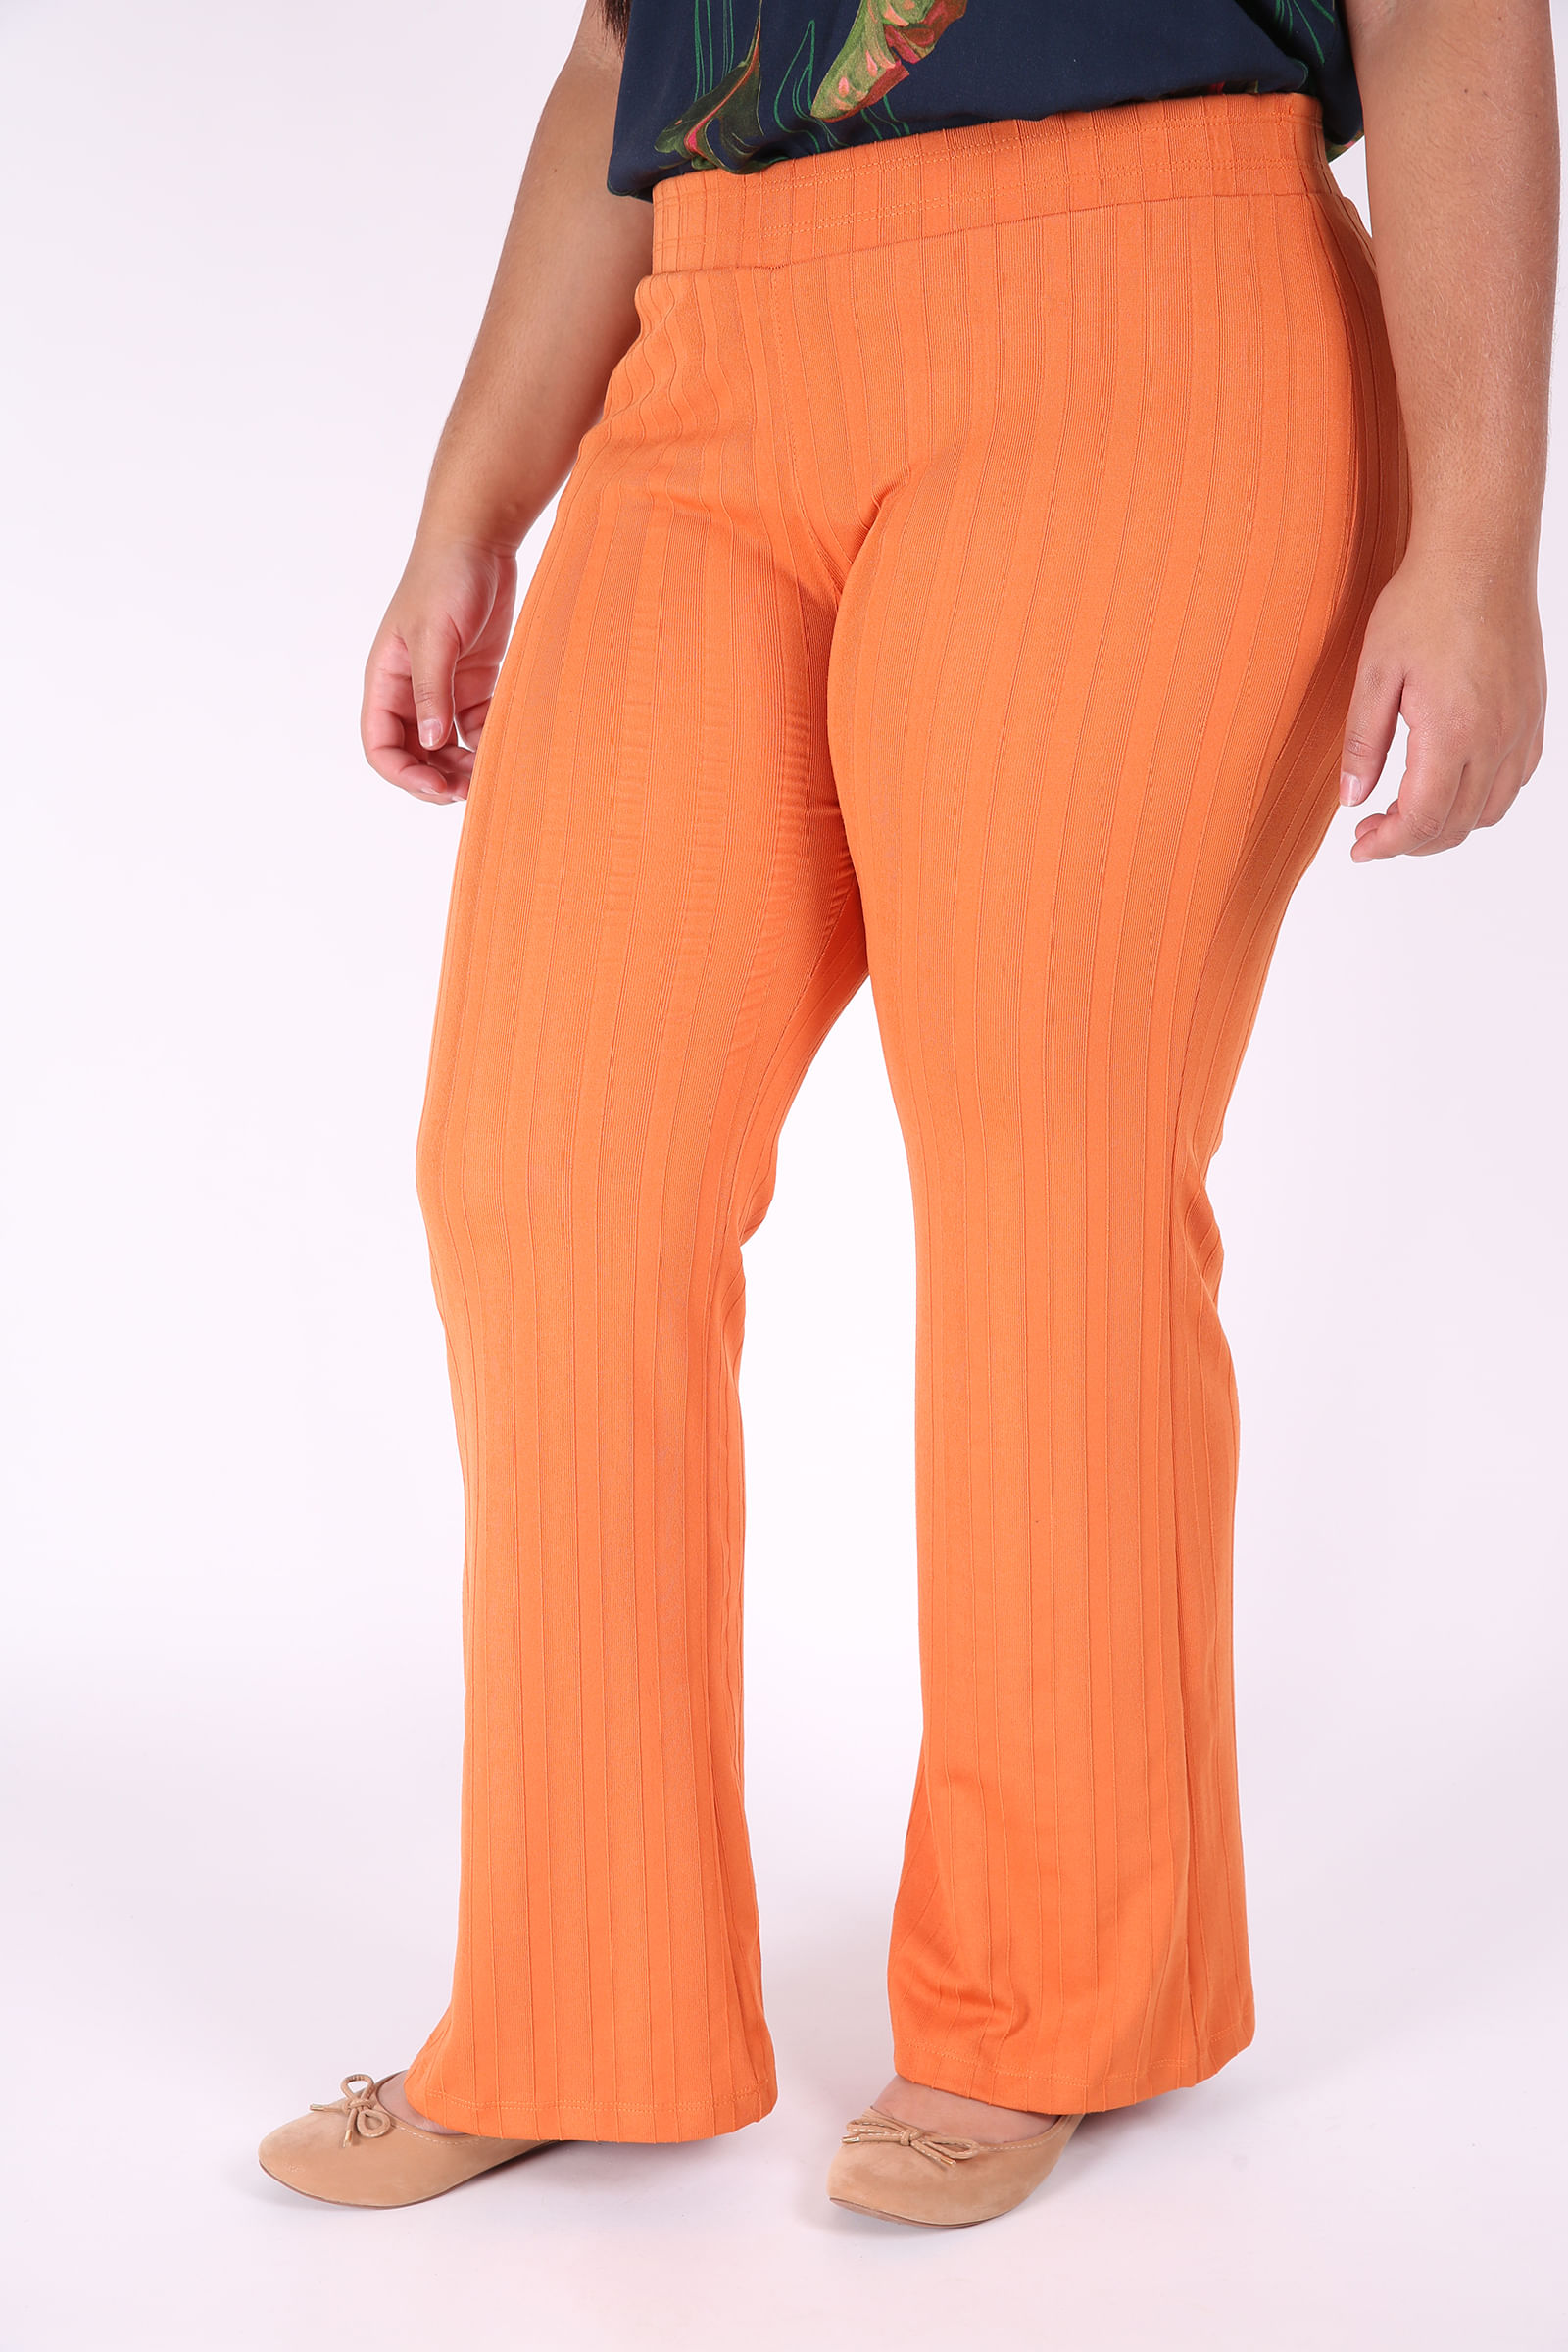 Calça flare feminina canelada plus size laranja